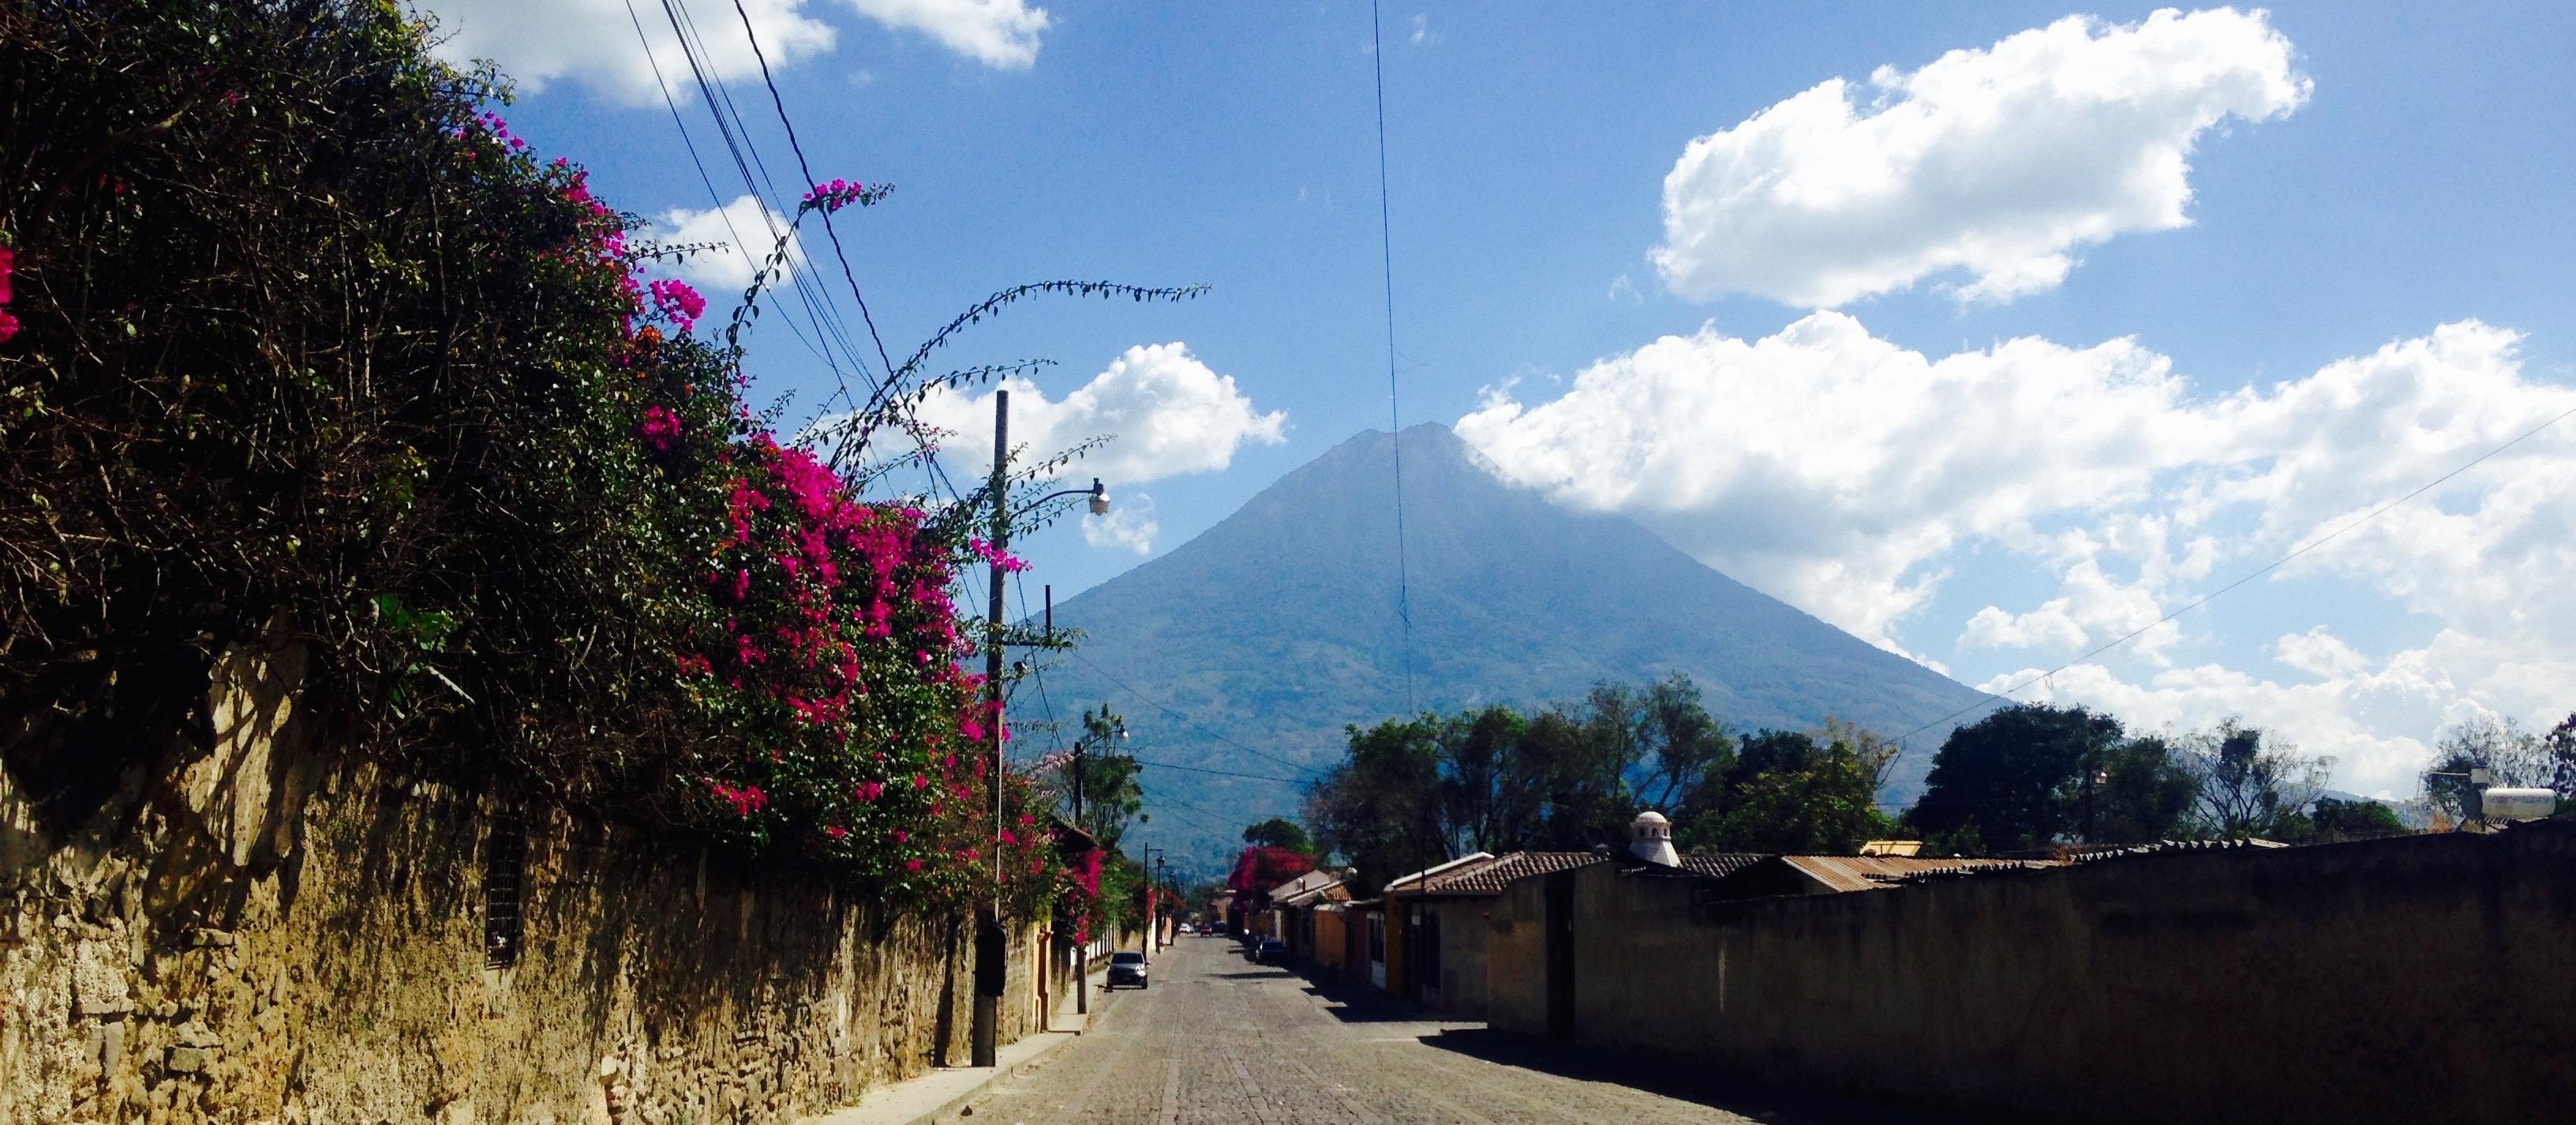 guatemala-travel-guide